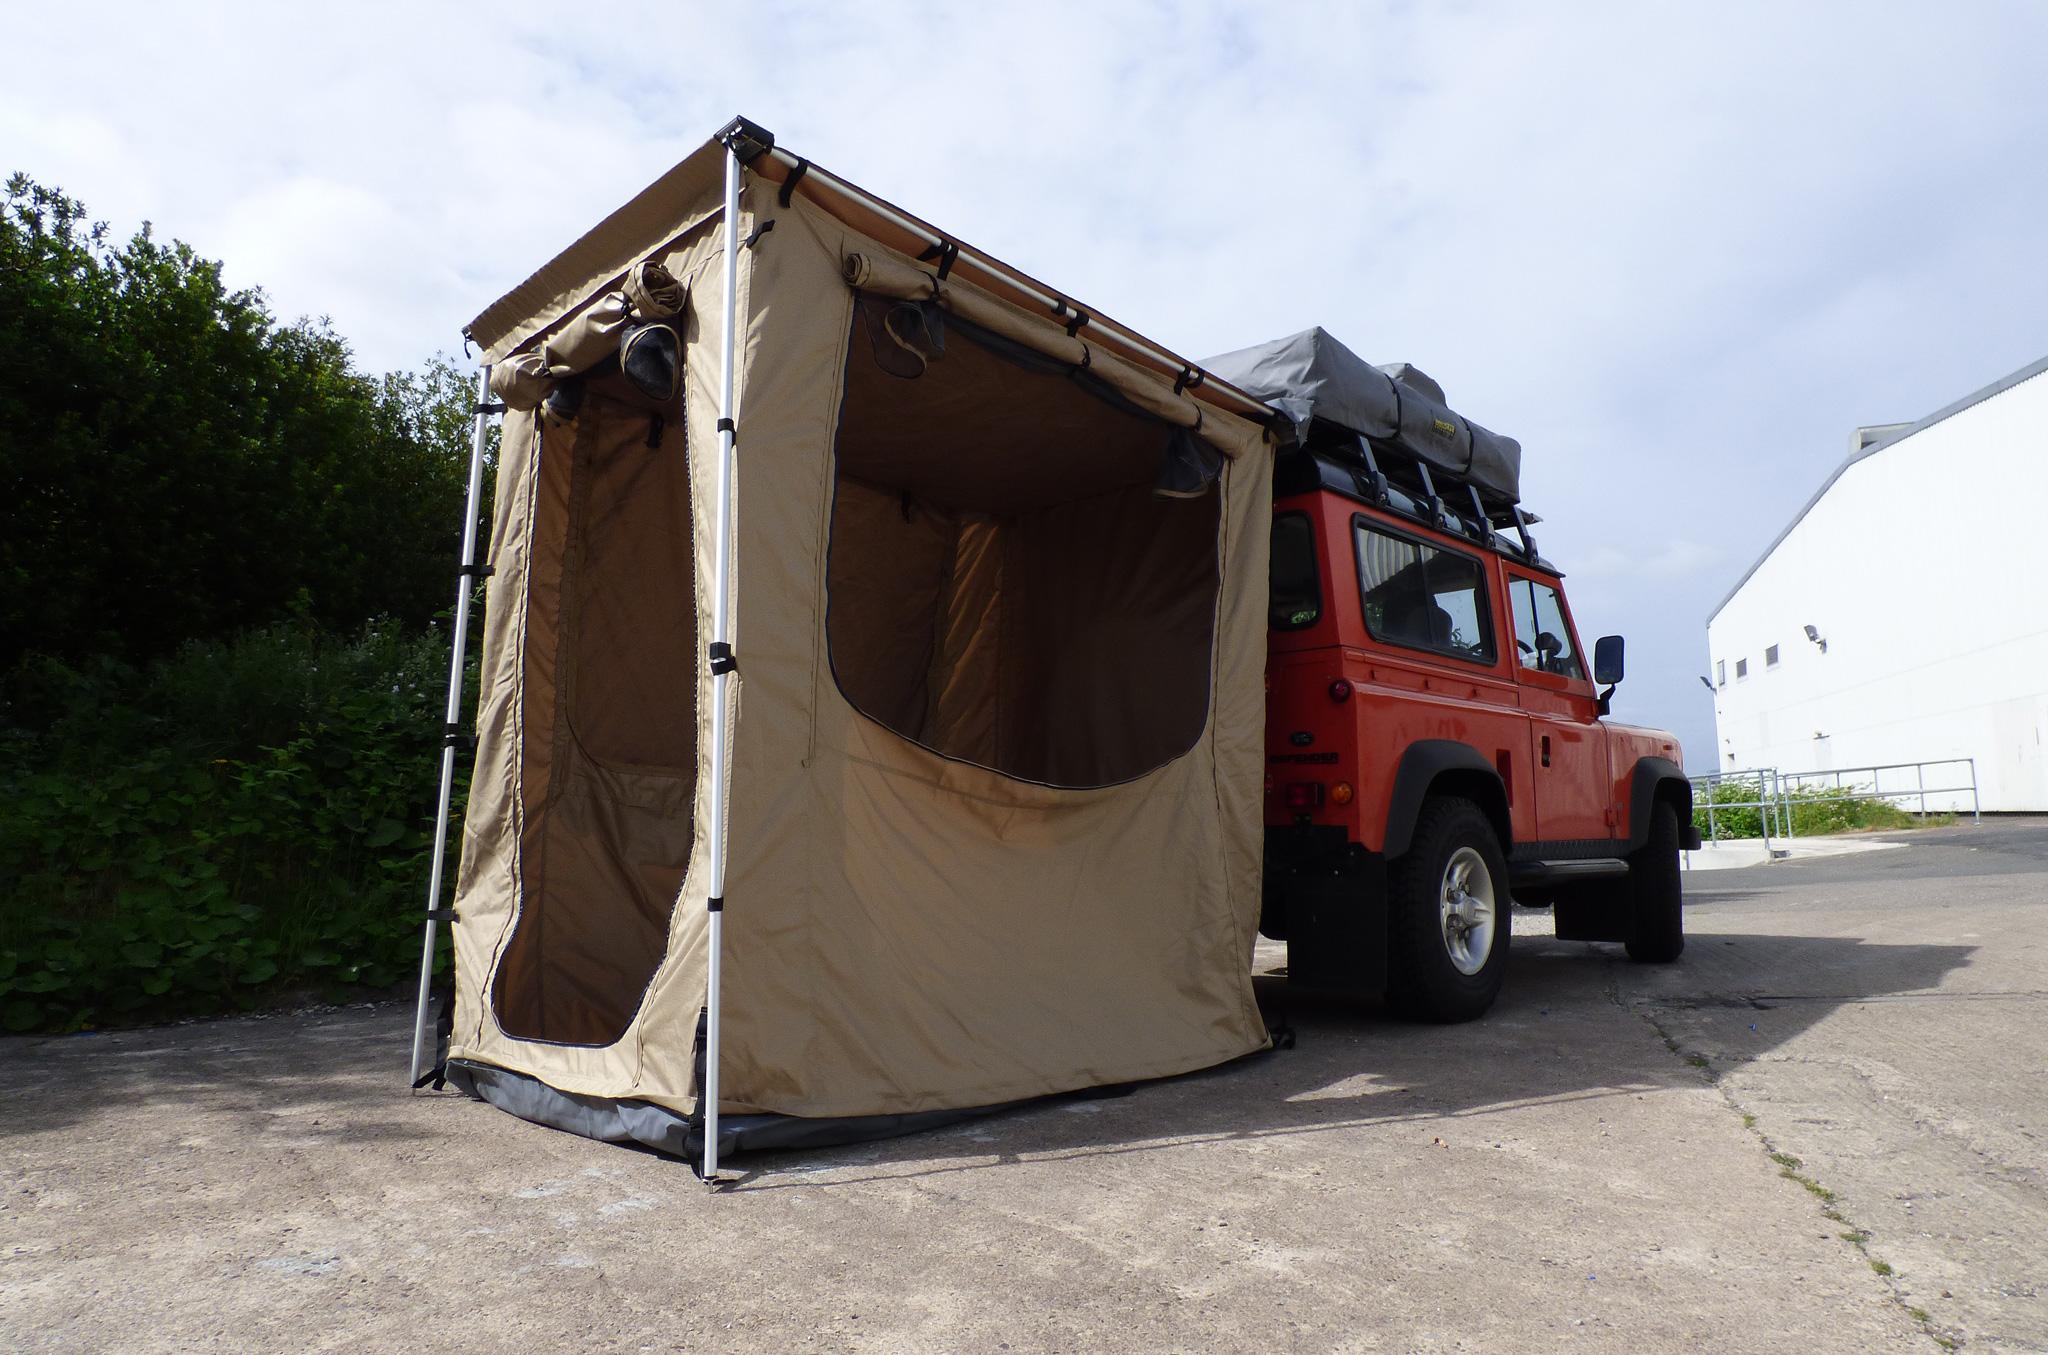 14M X 20M Pajero Shogun Tent Awning Expedition Safari Heavy Duty Exterior